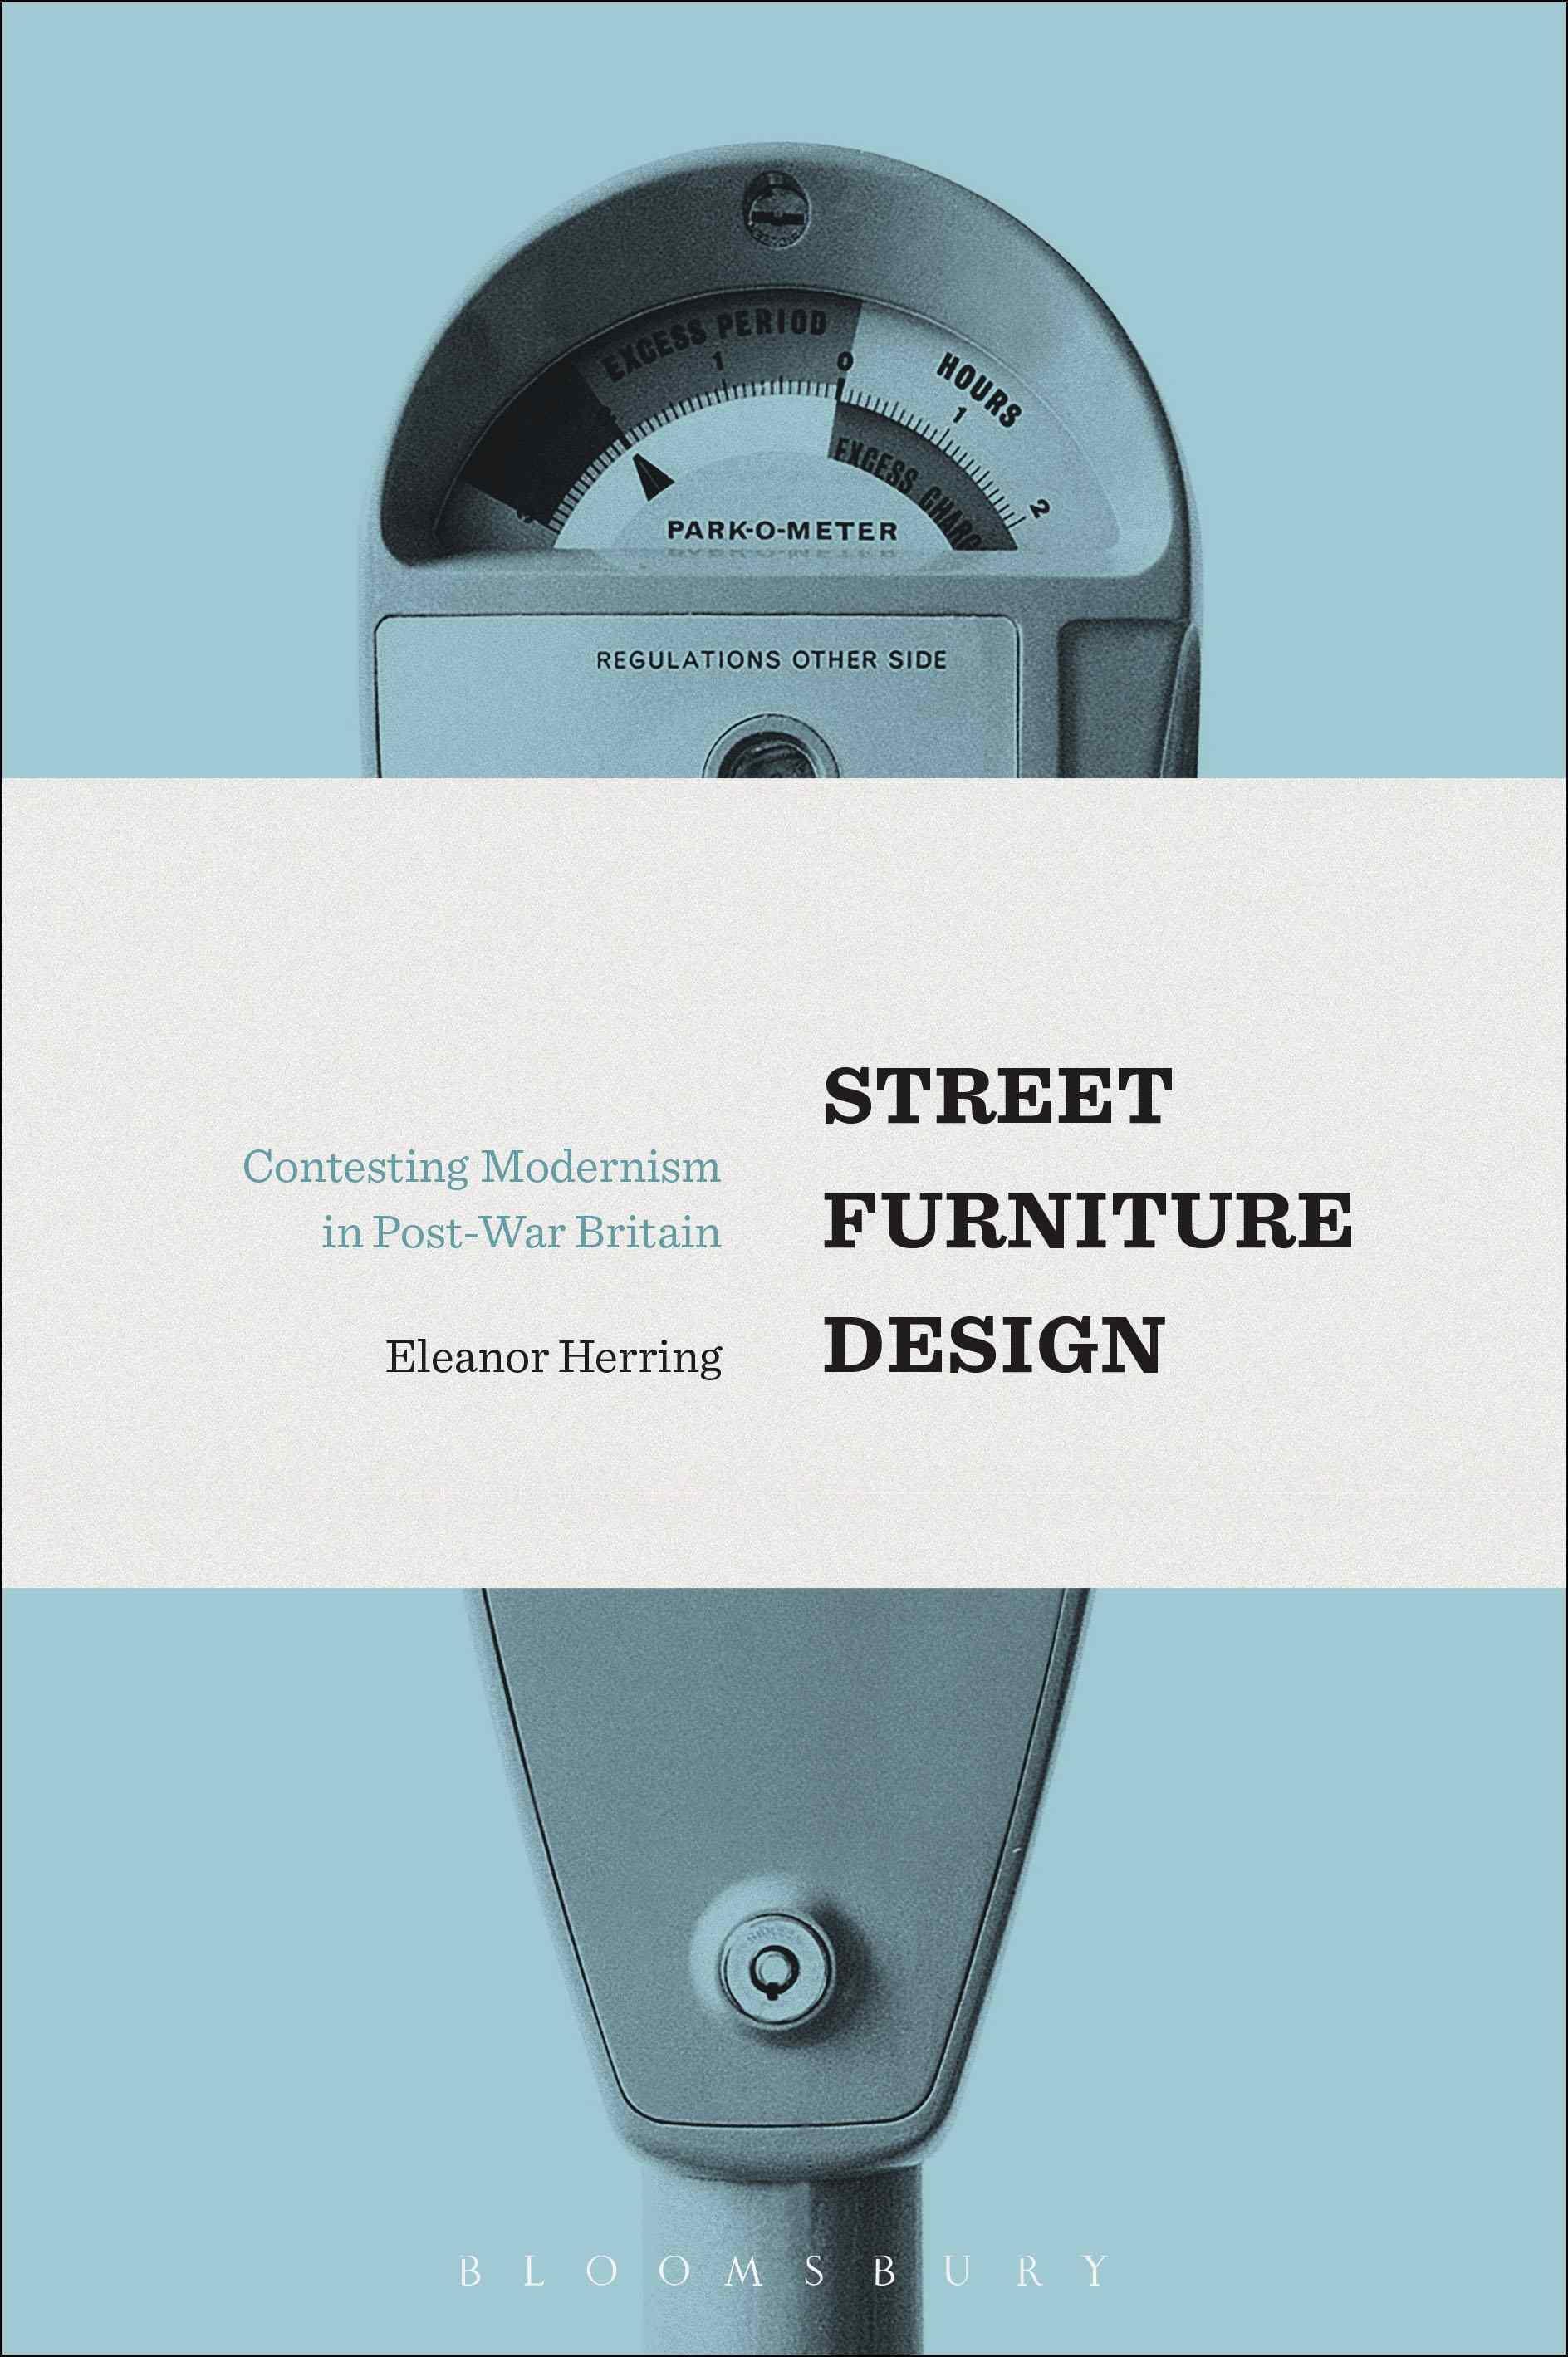 Bloomsbury Design Library eBooks